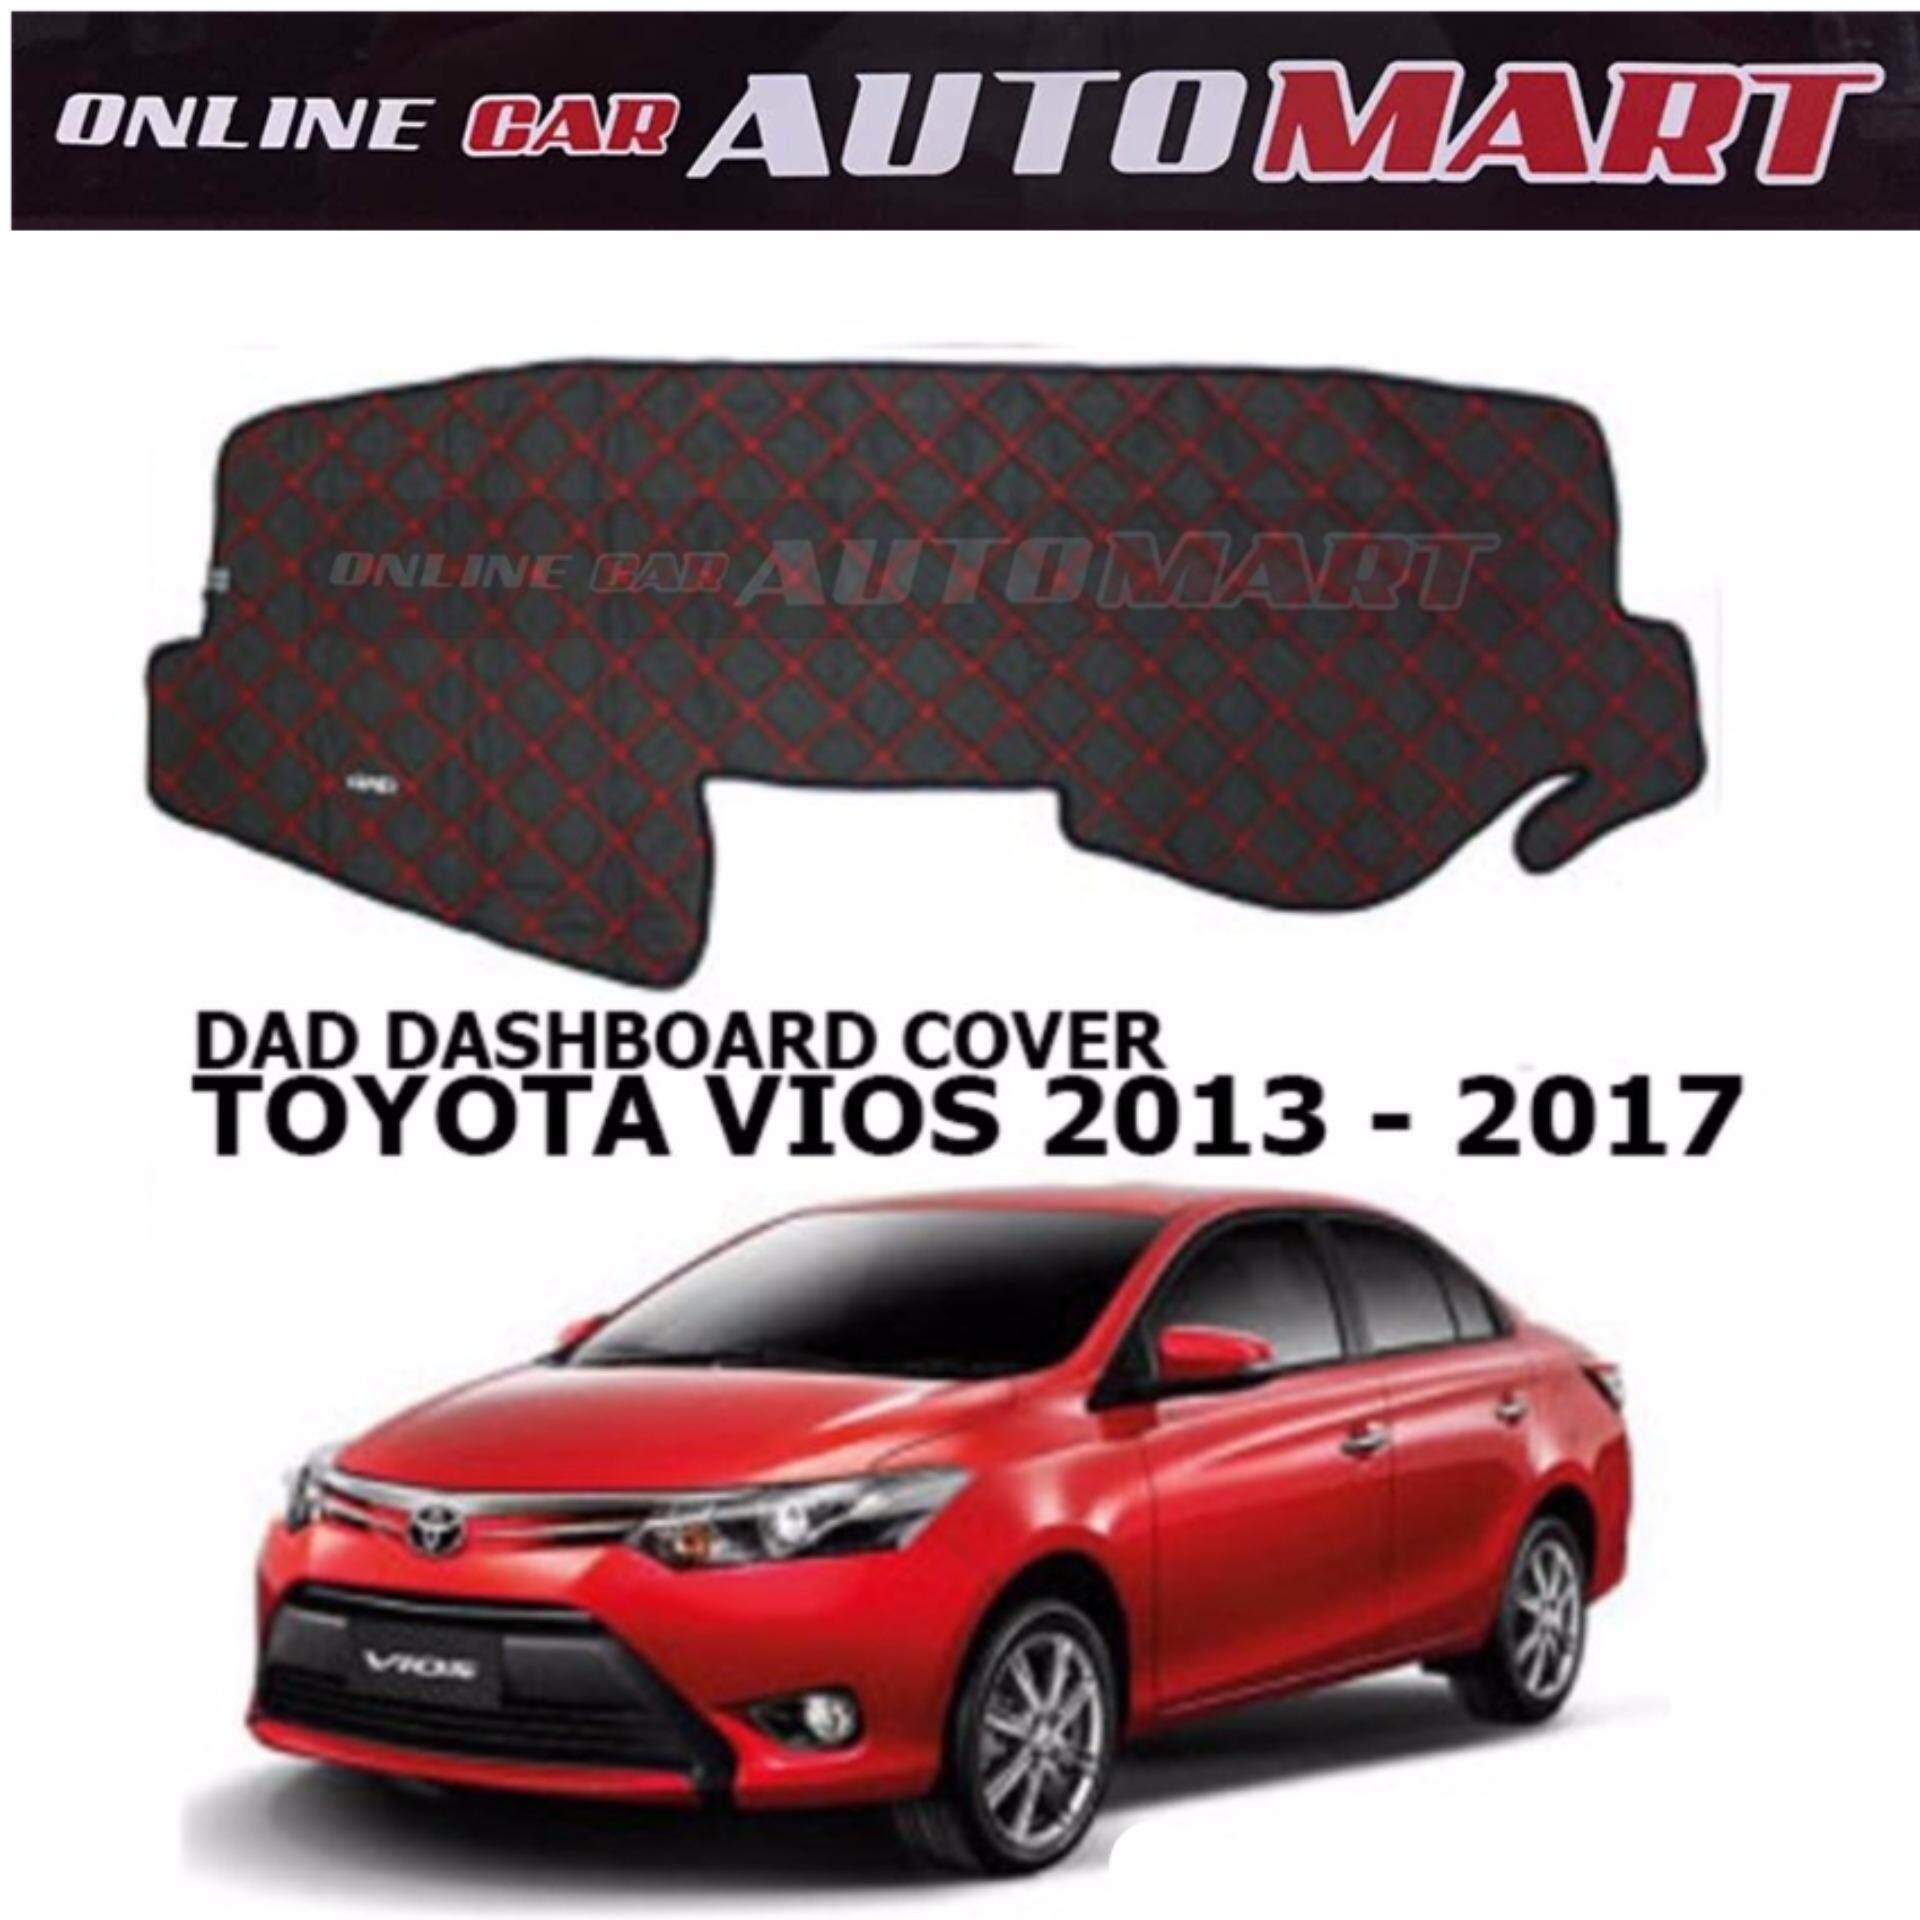 DAD Non Slip Dashboard Cover - Toyota Vios Yr 2013